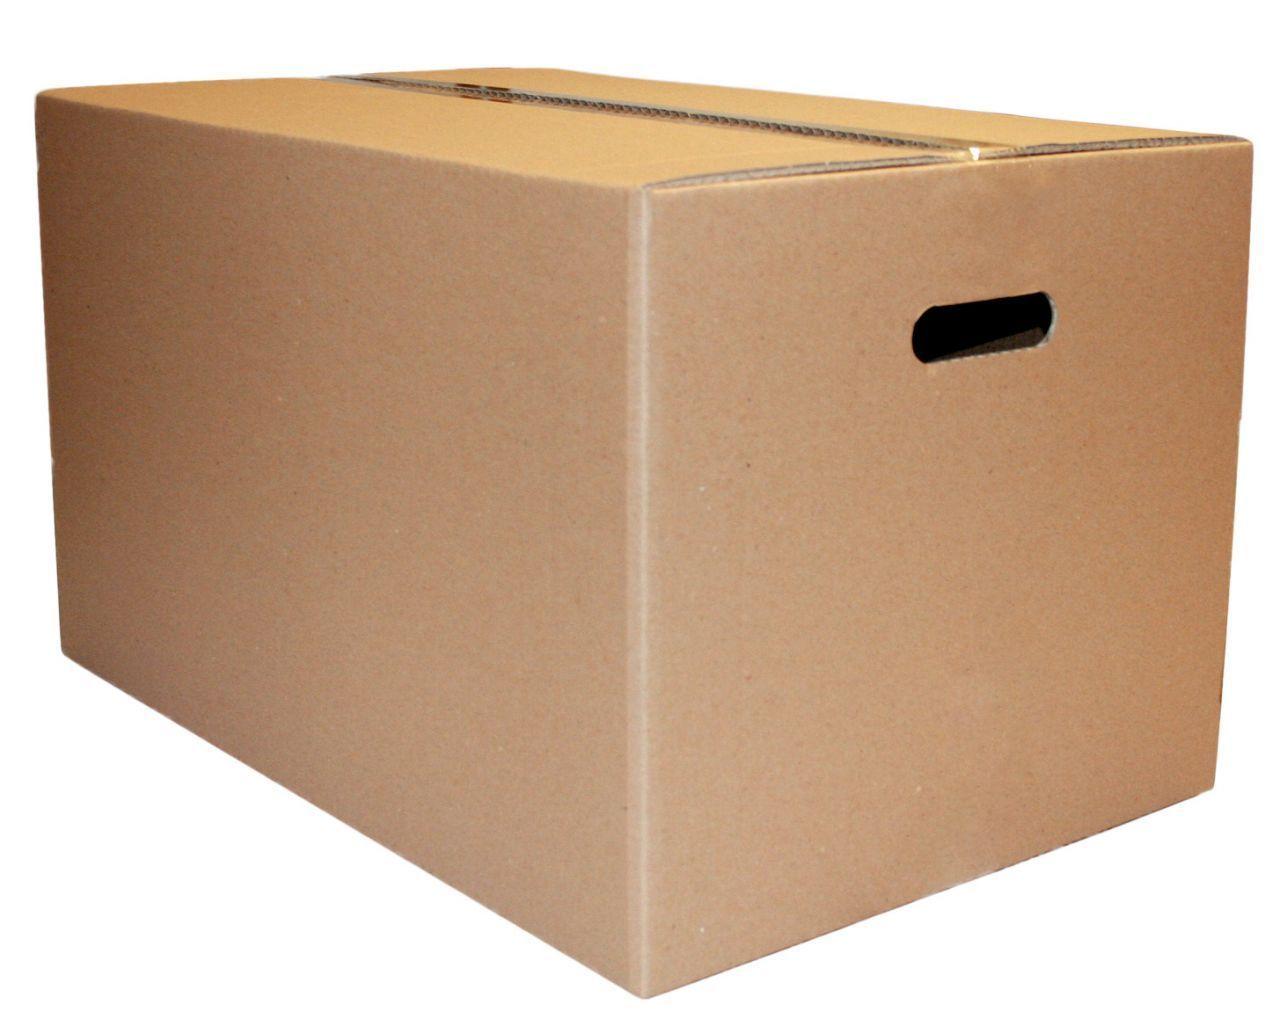 Csomagoló doboz TFL 600*400*300 mm, 5r., 10 db/köteg